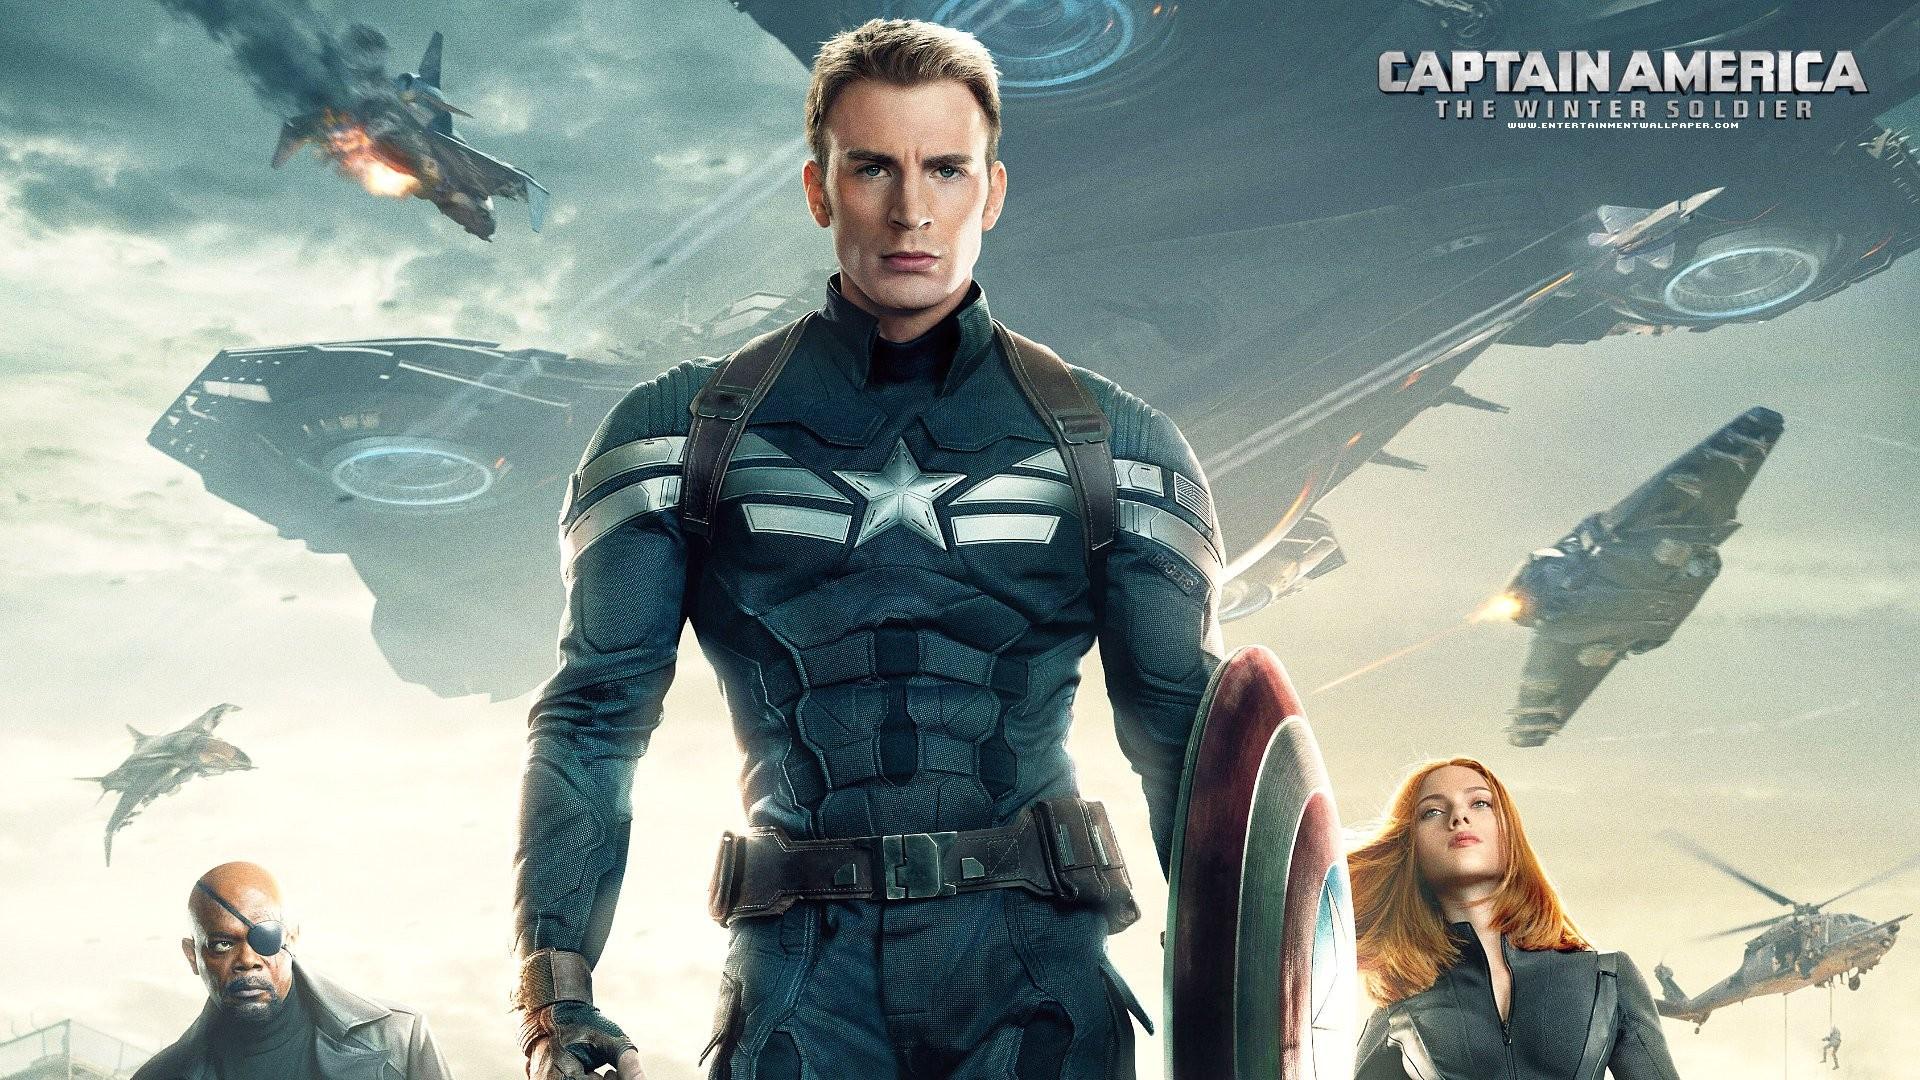 Captain America The Winter Soldier Wallpaper: Wallpaper : Superhero, Captain America, Scarlett Johansson